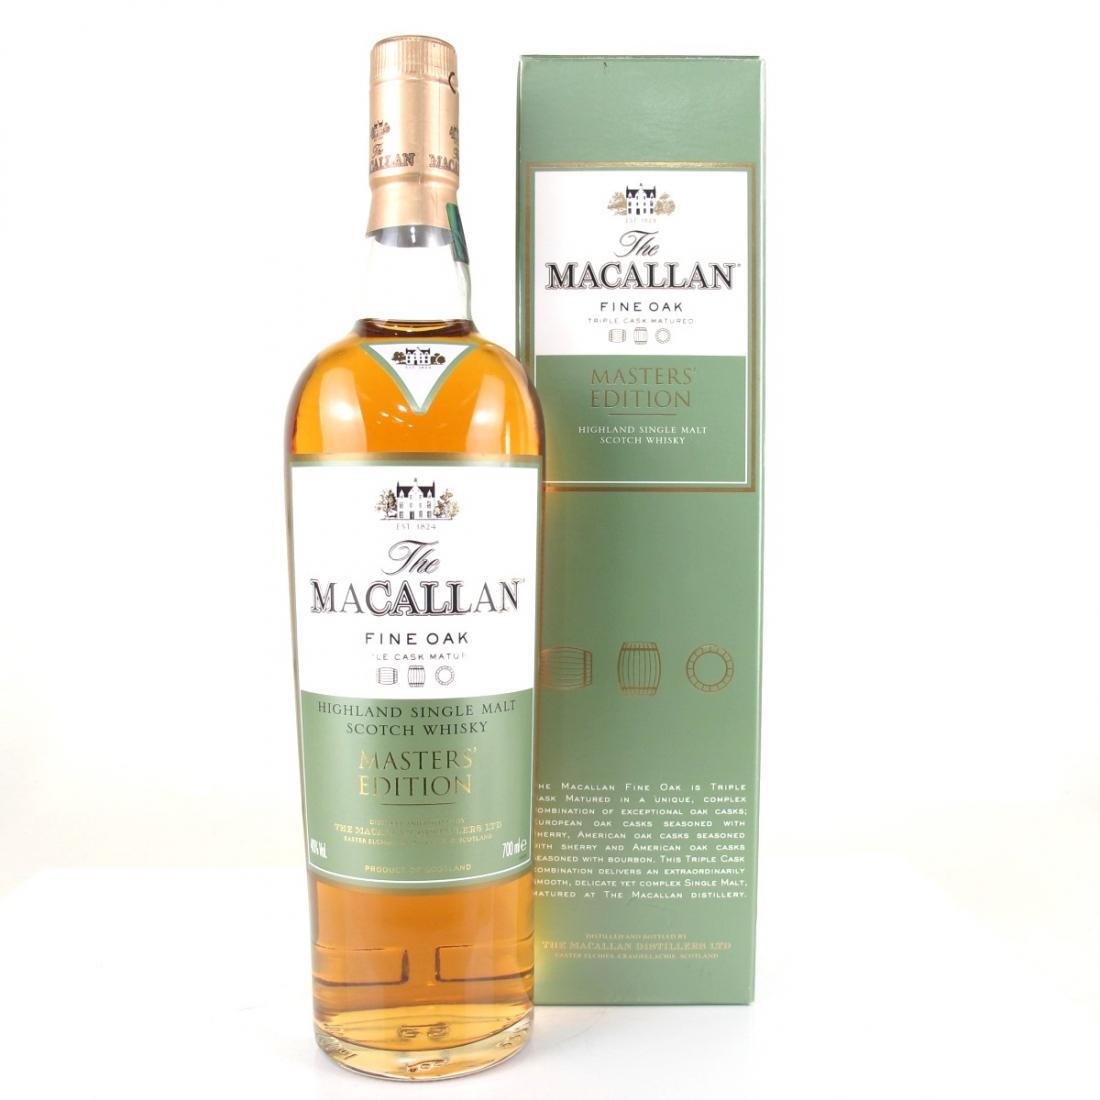 Macallan Fine Oak Masters Edition